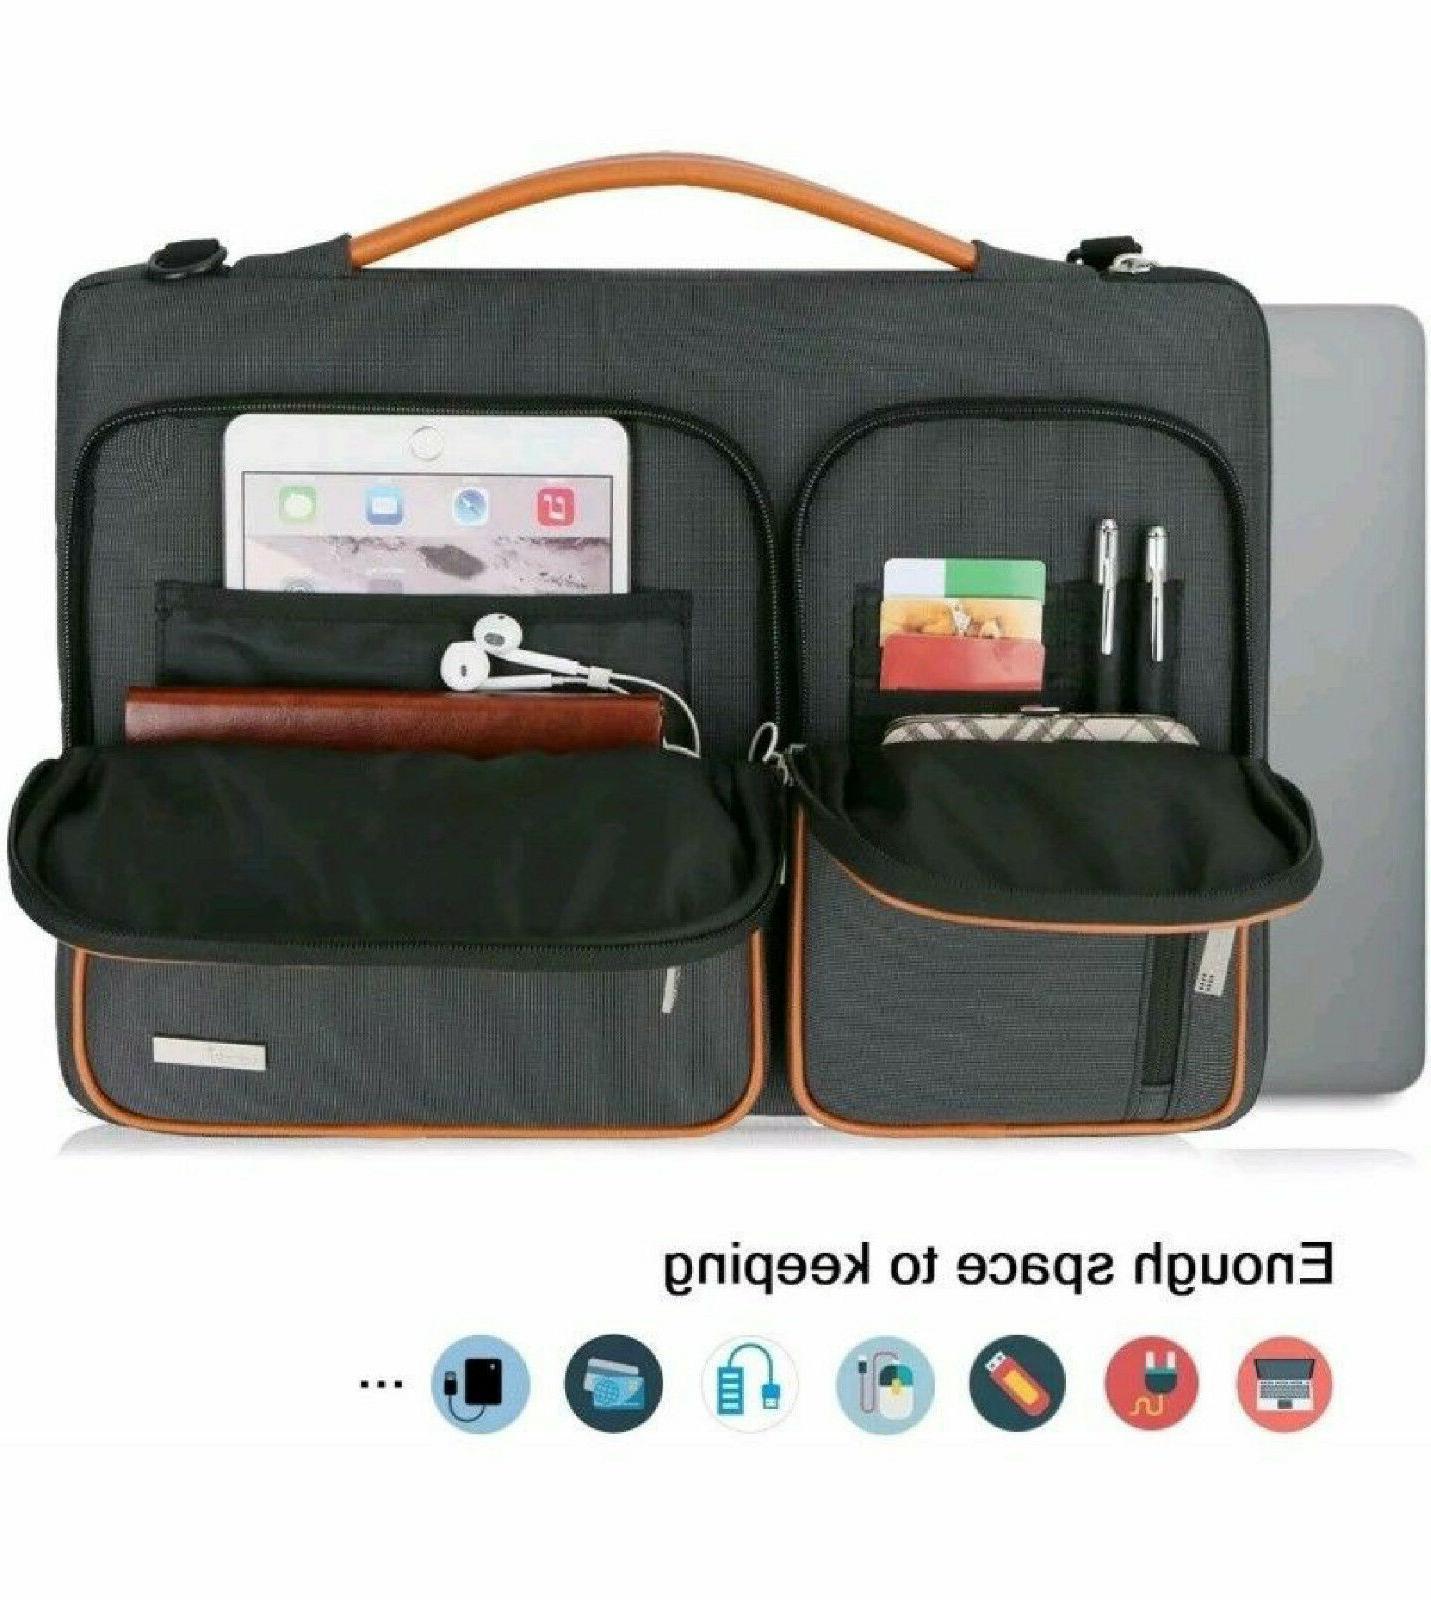 Lacdo Laptop Tablet Sleeve Bag SHOCKPROOF 4